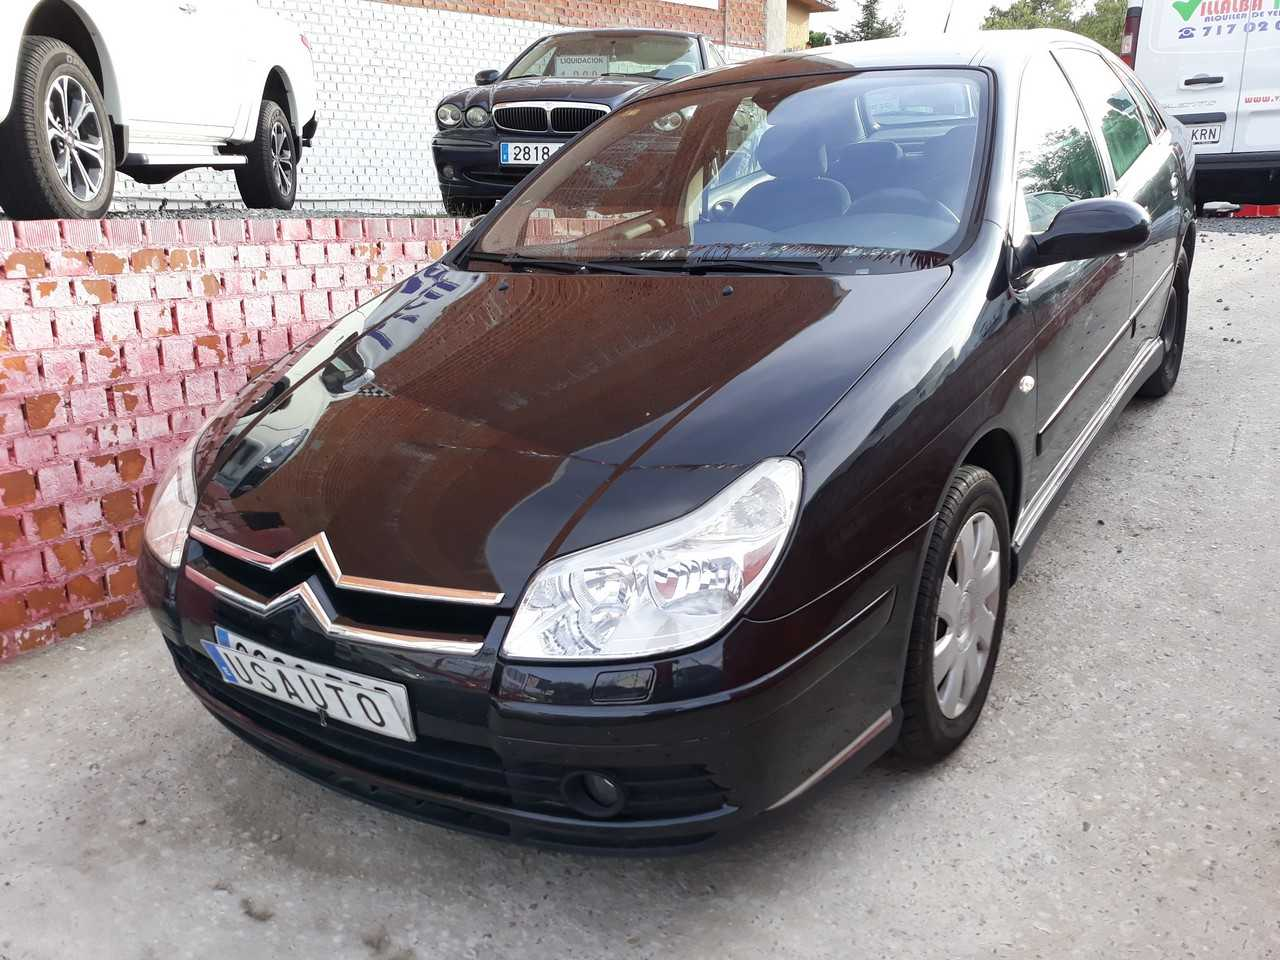 Citroën C5 1.6 HDI COLLECTION 110 CV   - Foto 1